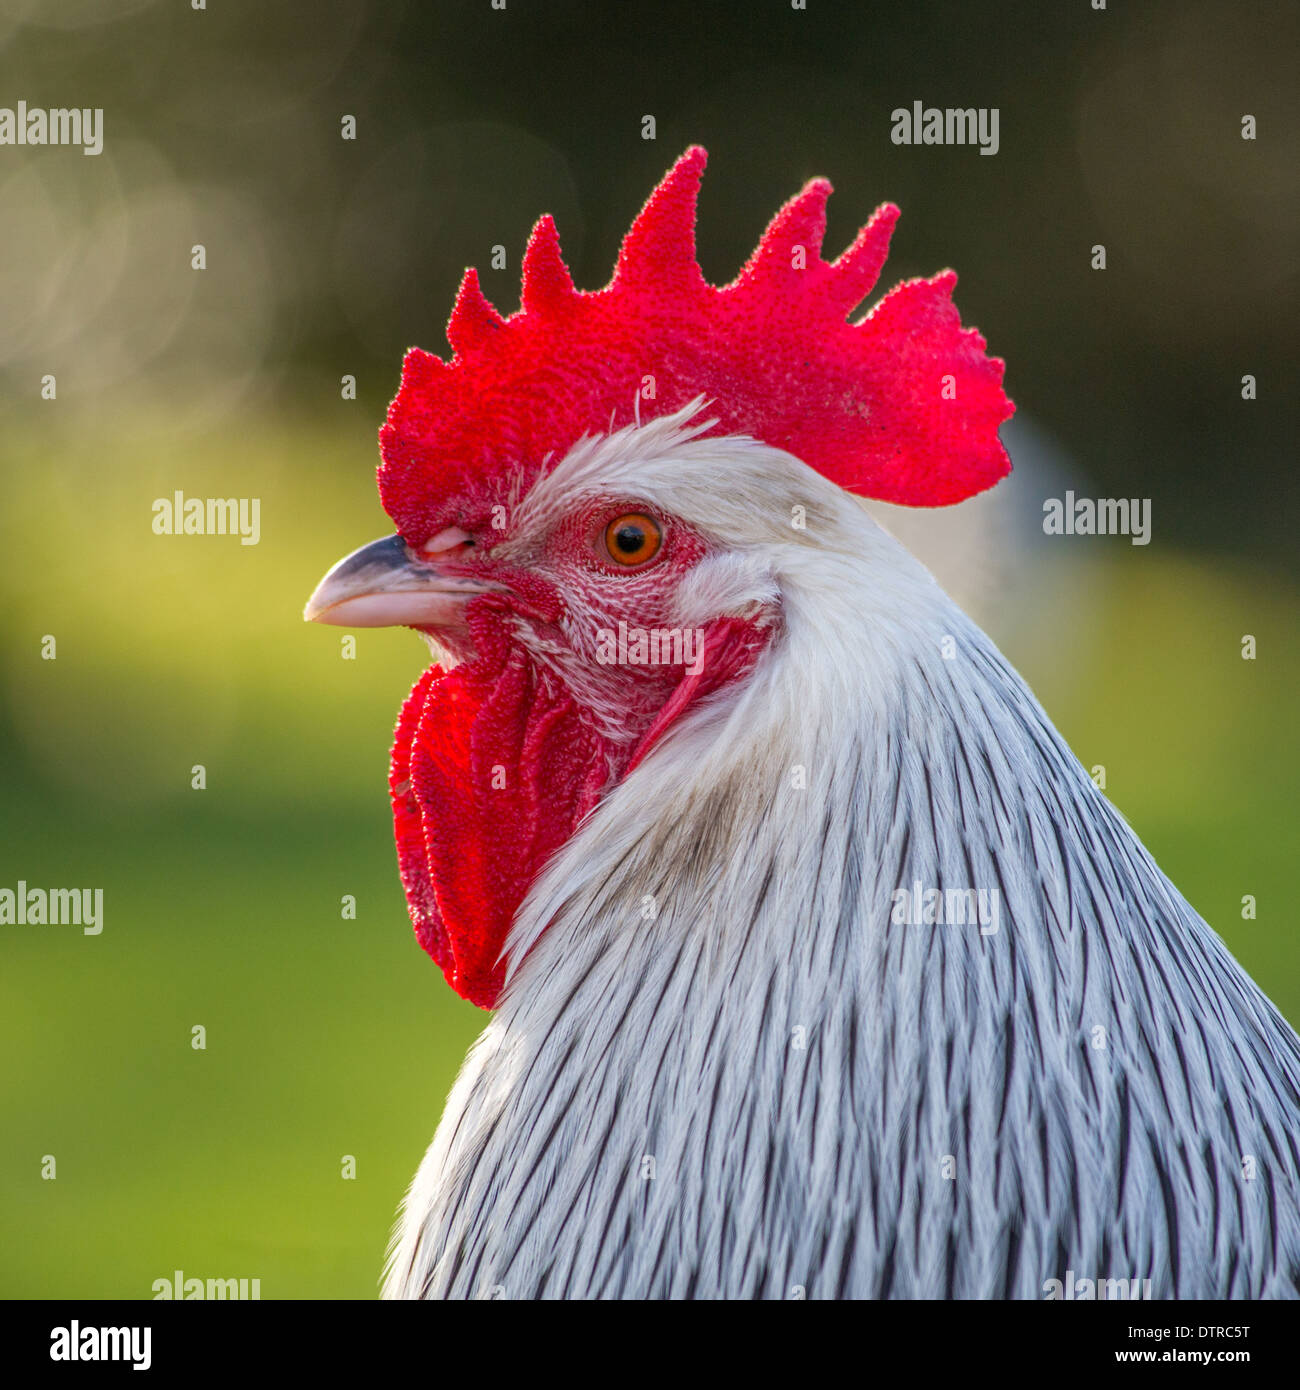 Sussex chicken cockerel - Stock Image